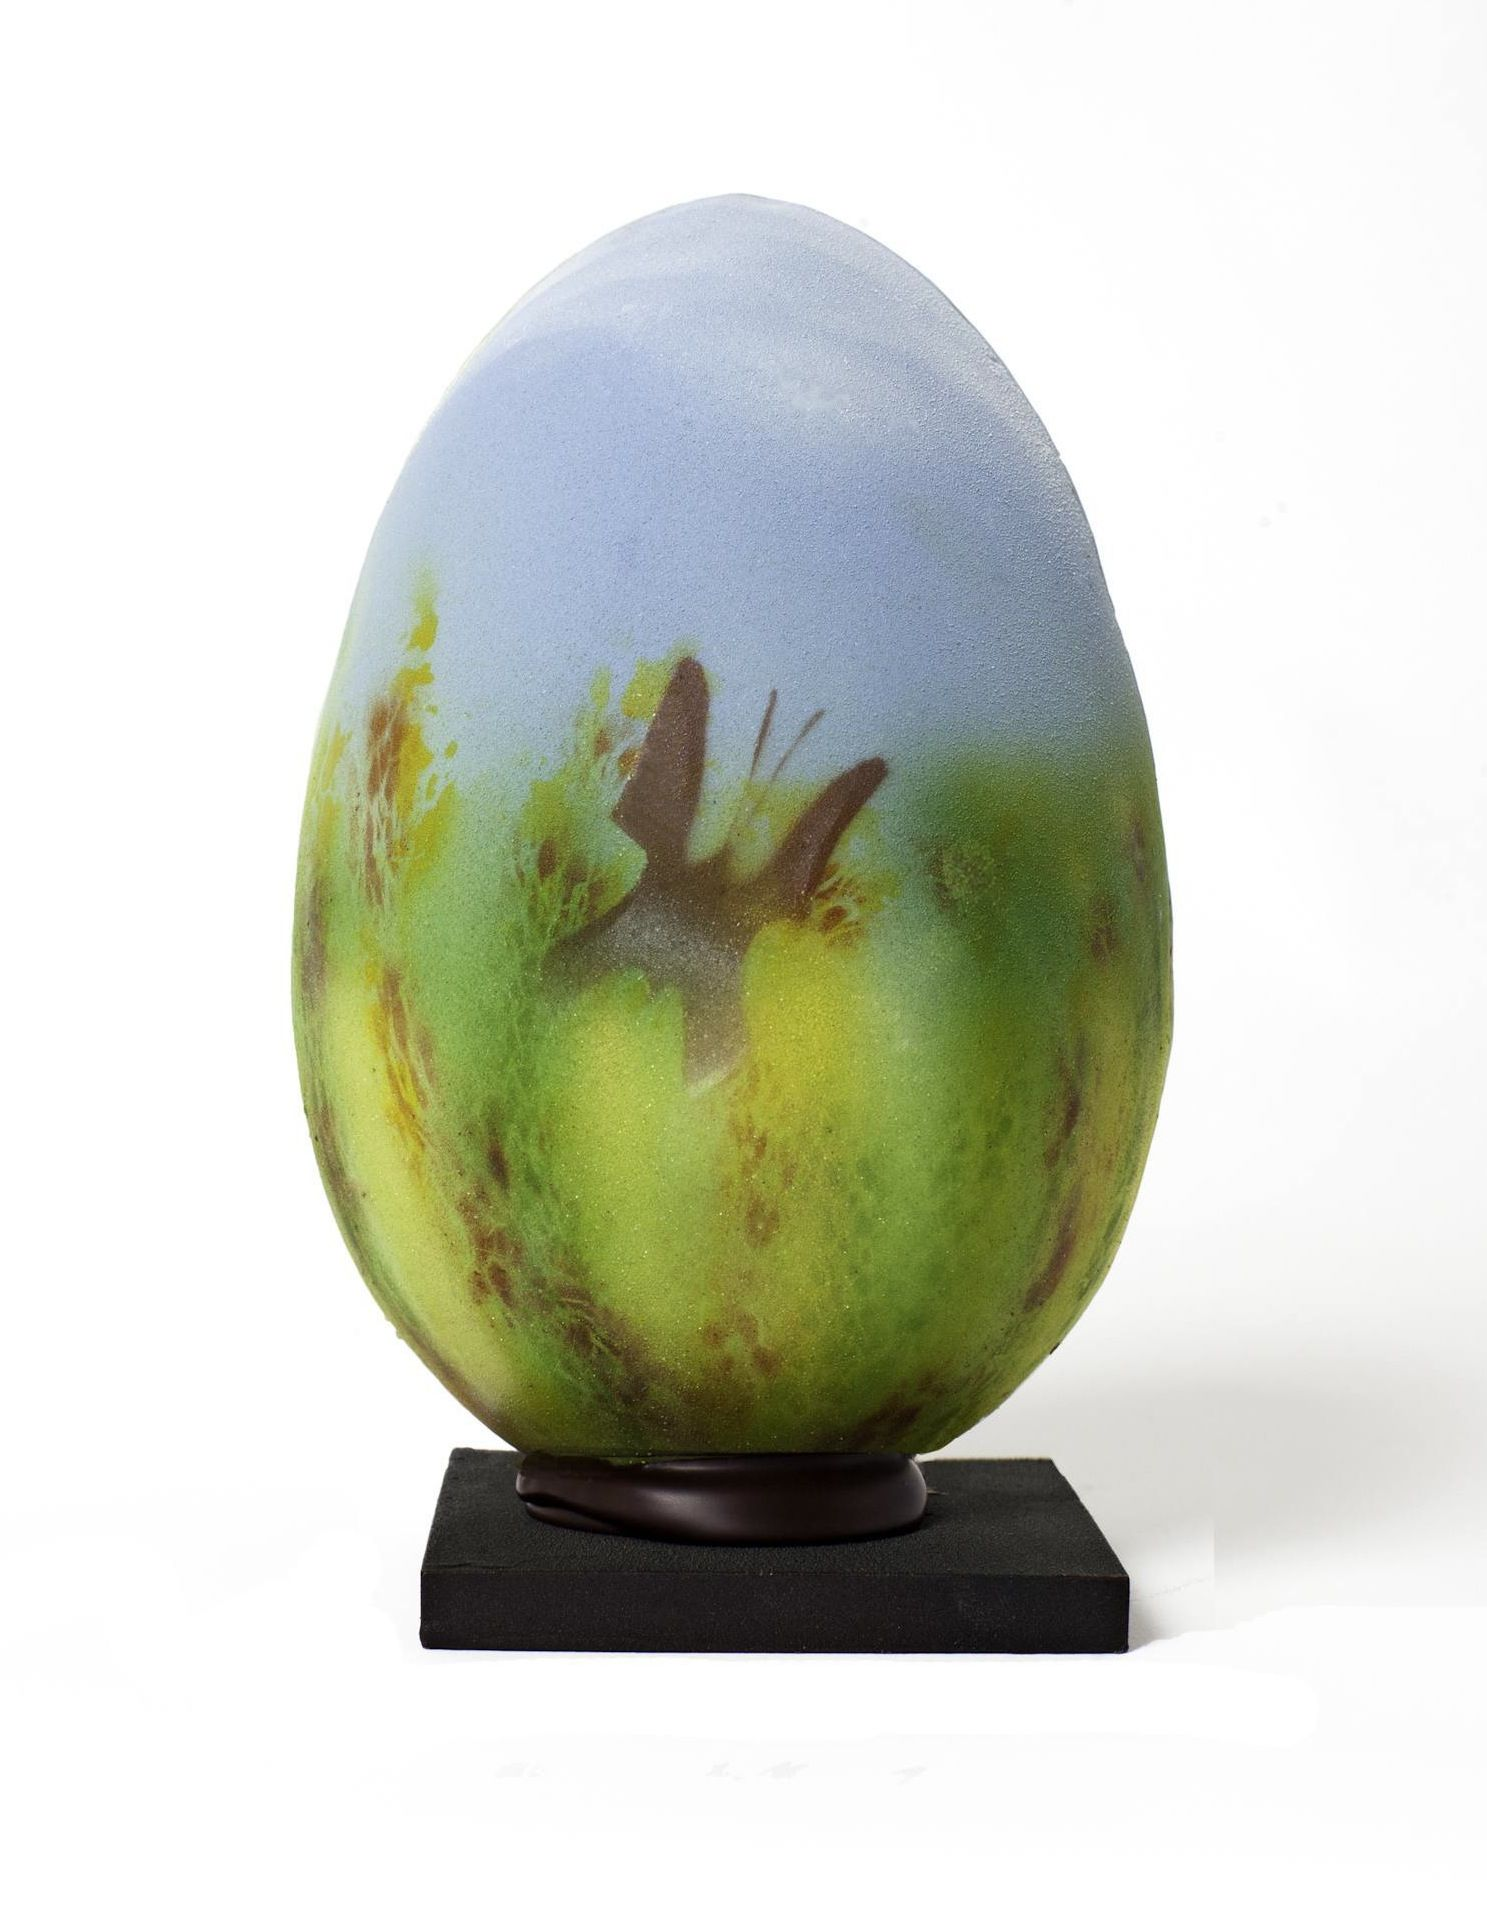 Paul Wayne Gregory's Season egg